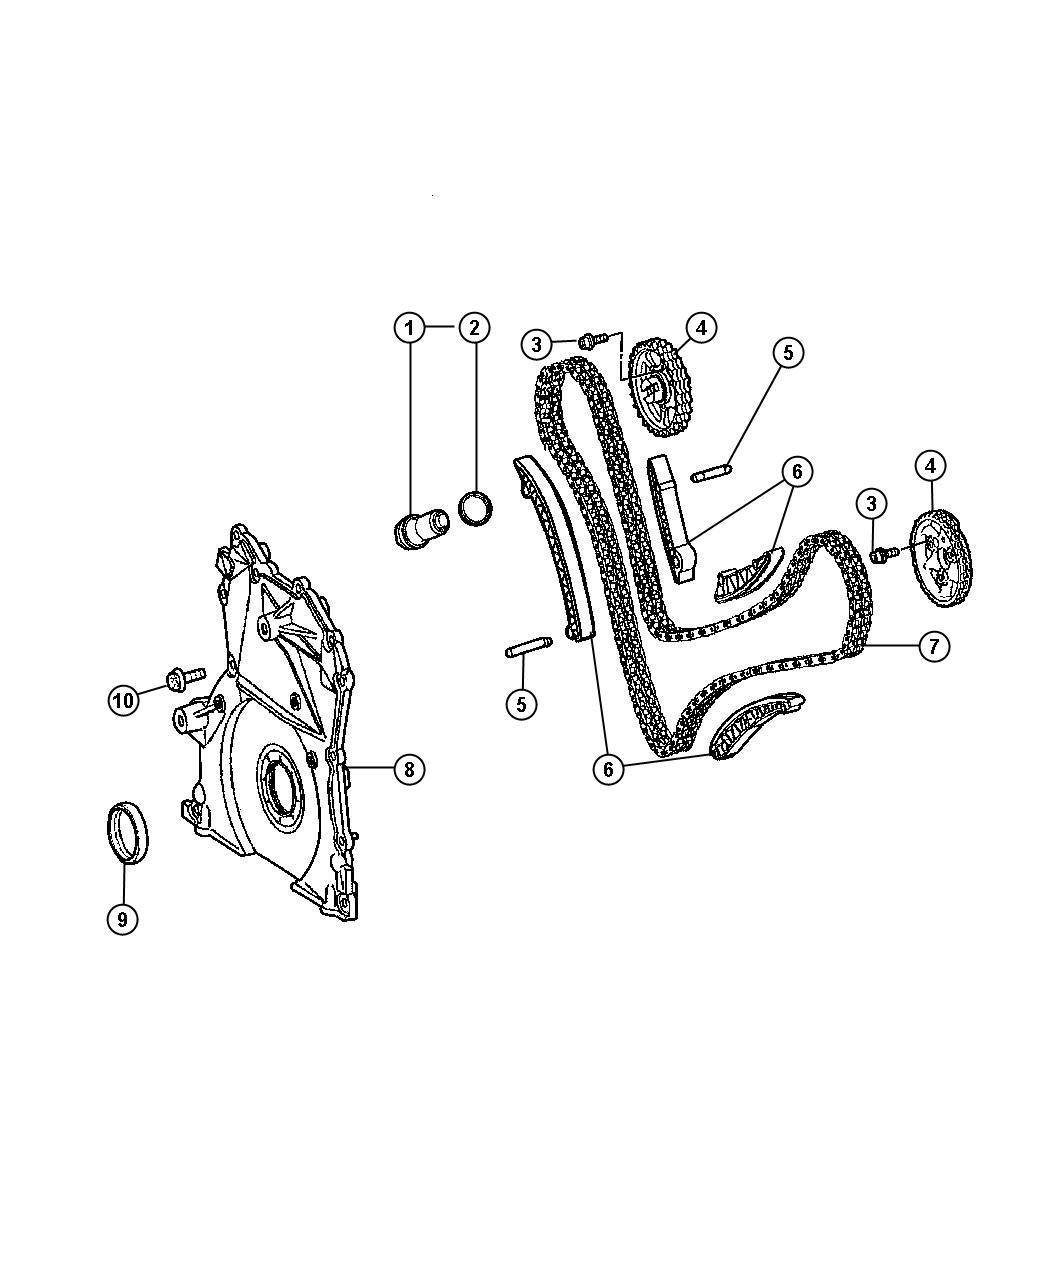 Jeep Grand Cherokee Chain Timingsel Engine